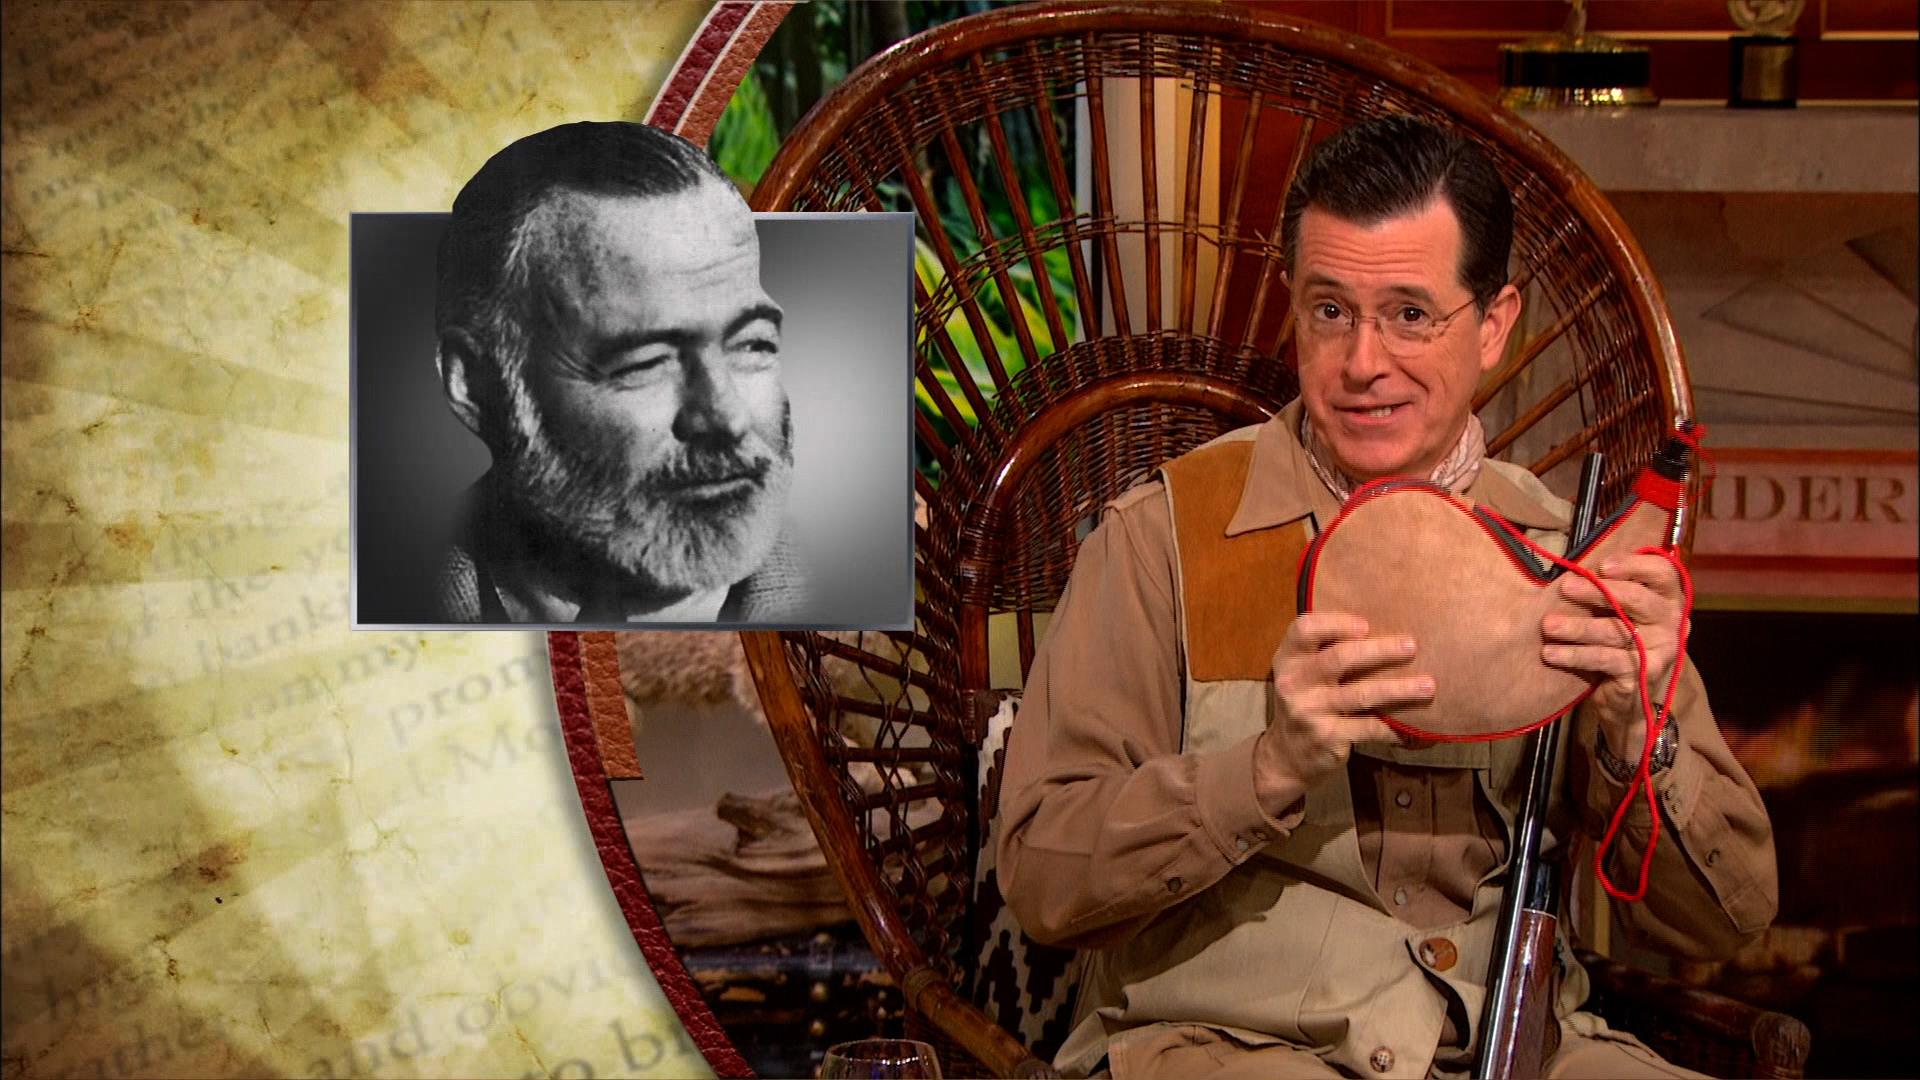 January 21, 2014 - Michael Chabon & Mariel Hemingway